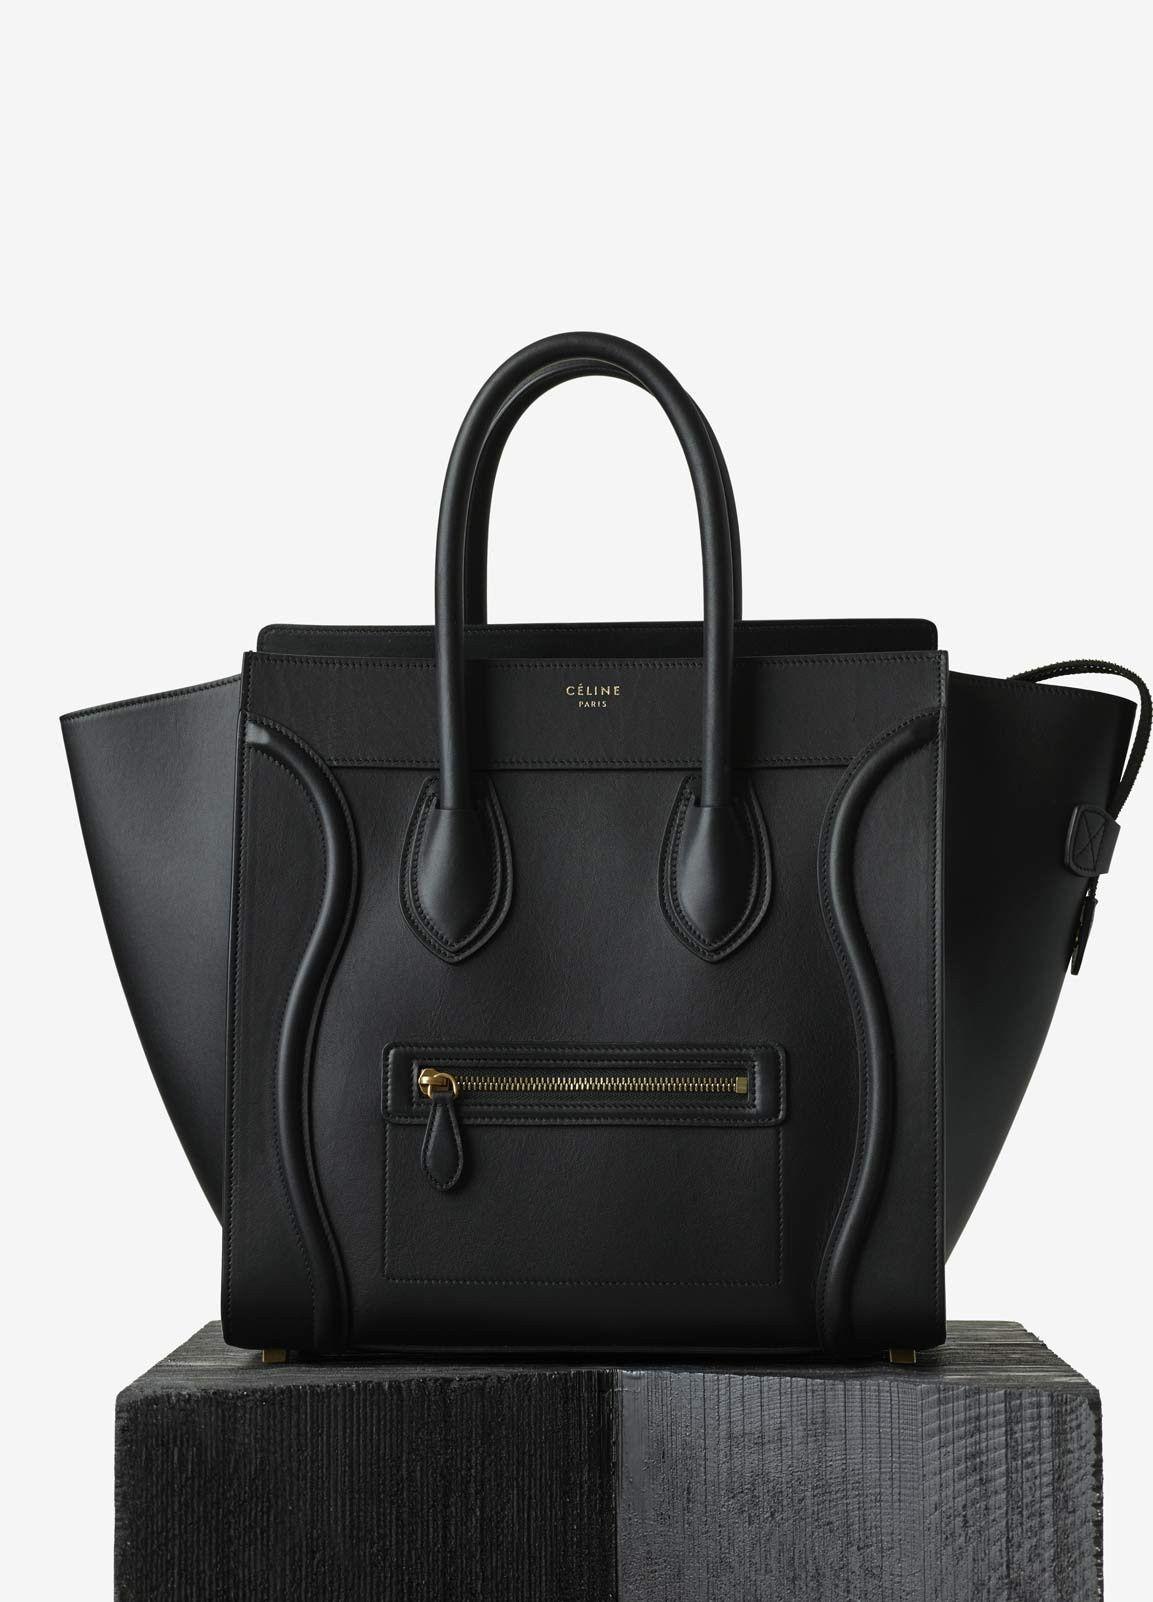 Mini Luggage Handbag in Smooth Calfskin - Céline   Bags I Can t ... 558f7e9120